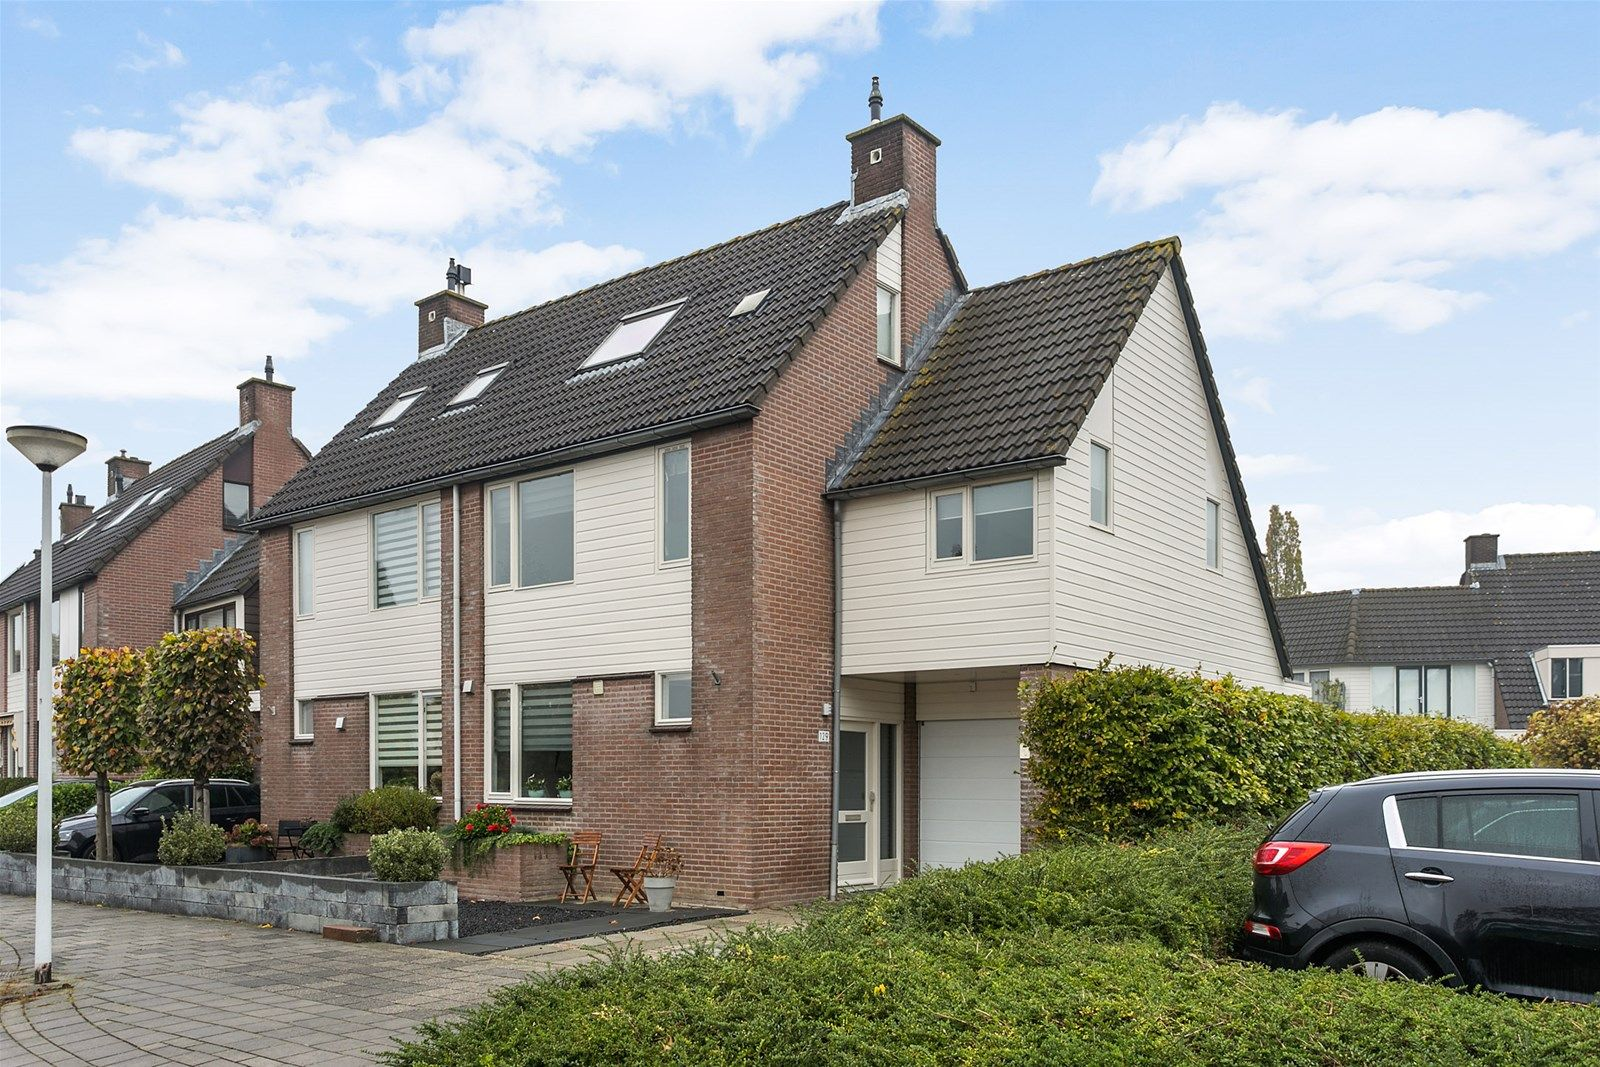 Abelenhof 129, Papendrecht